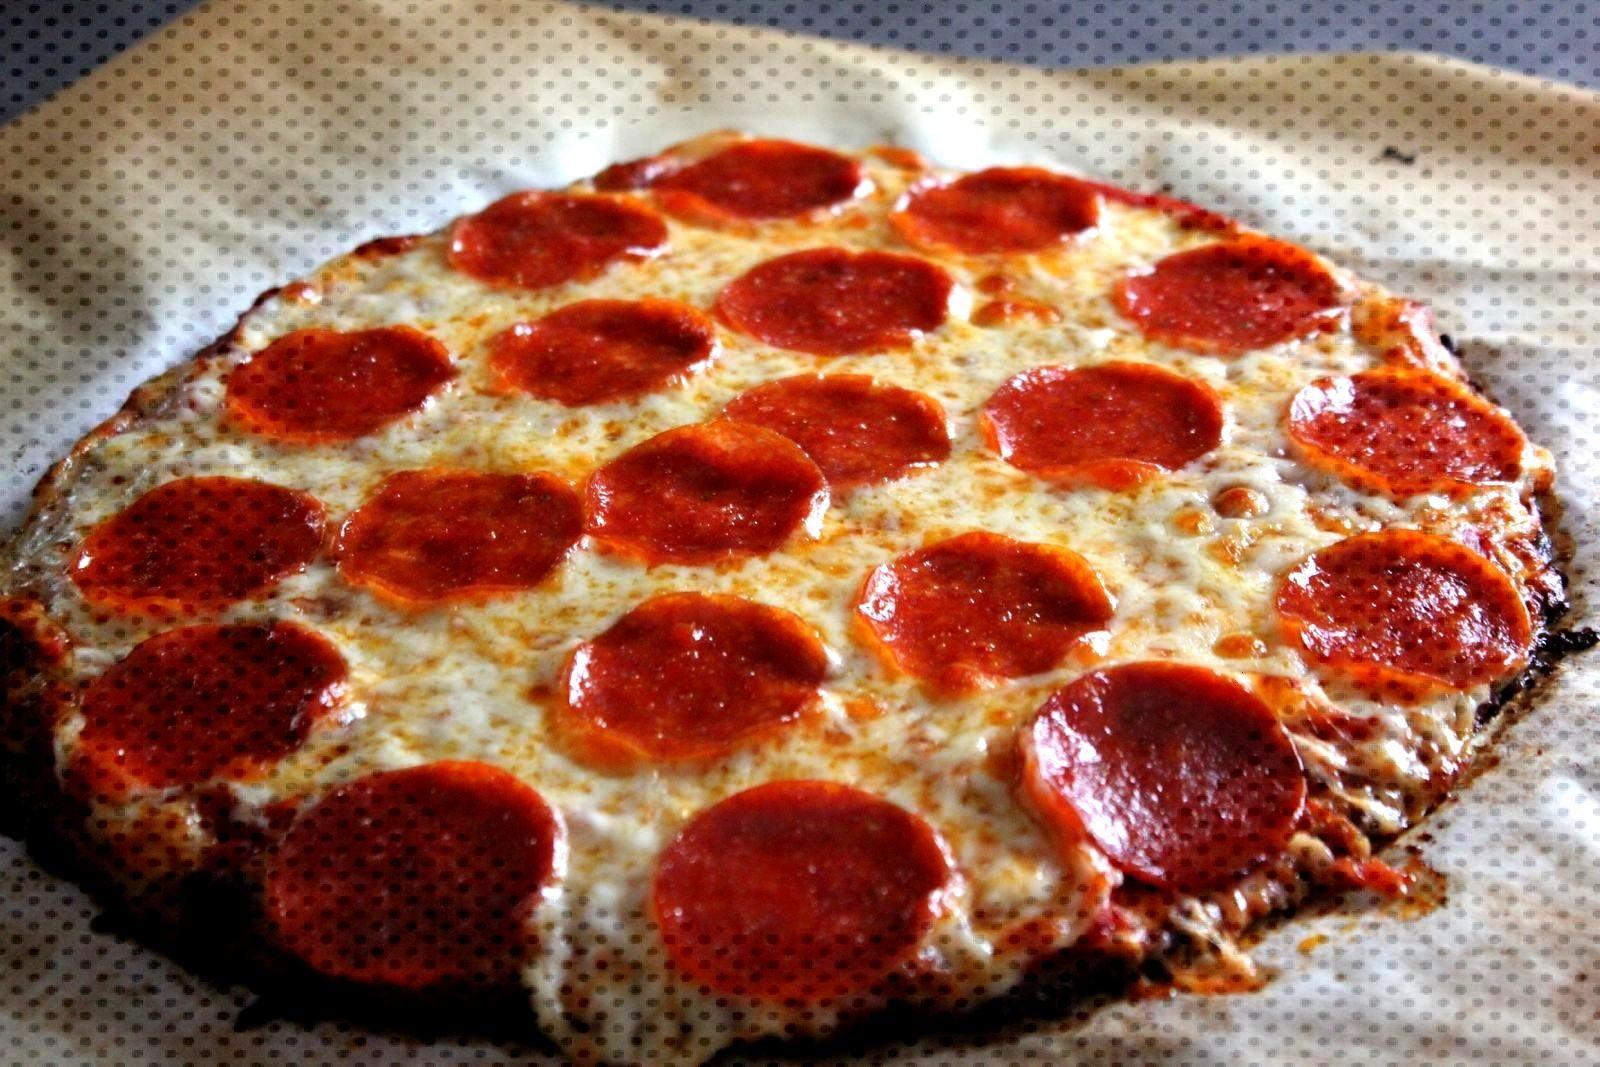 Punkie Pies Place Cauliflower Pizza Crust Pepperoni Pizza Punkie Pies Place Cauliflower Pizza C